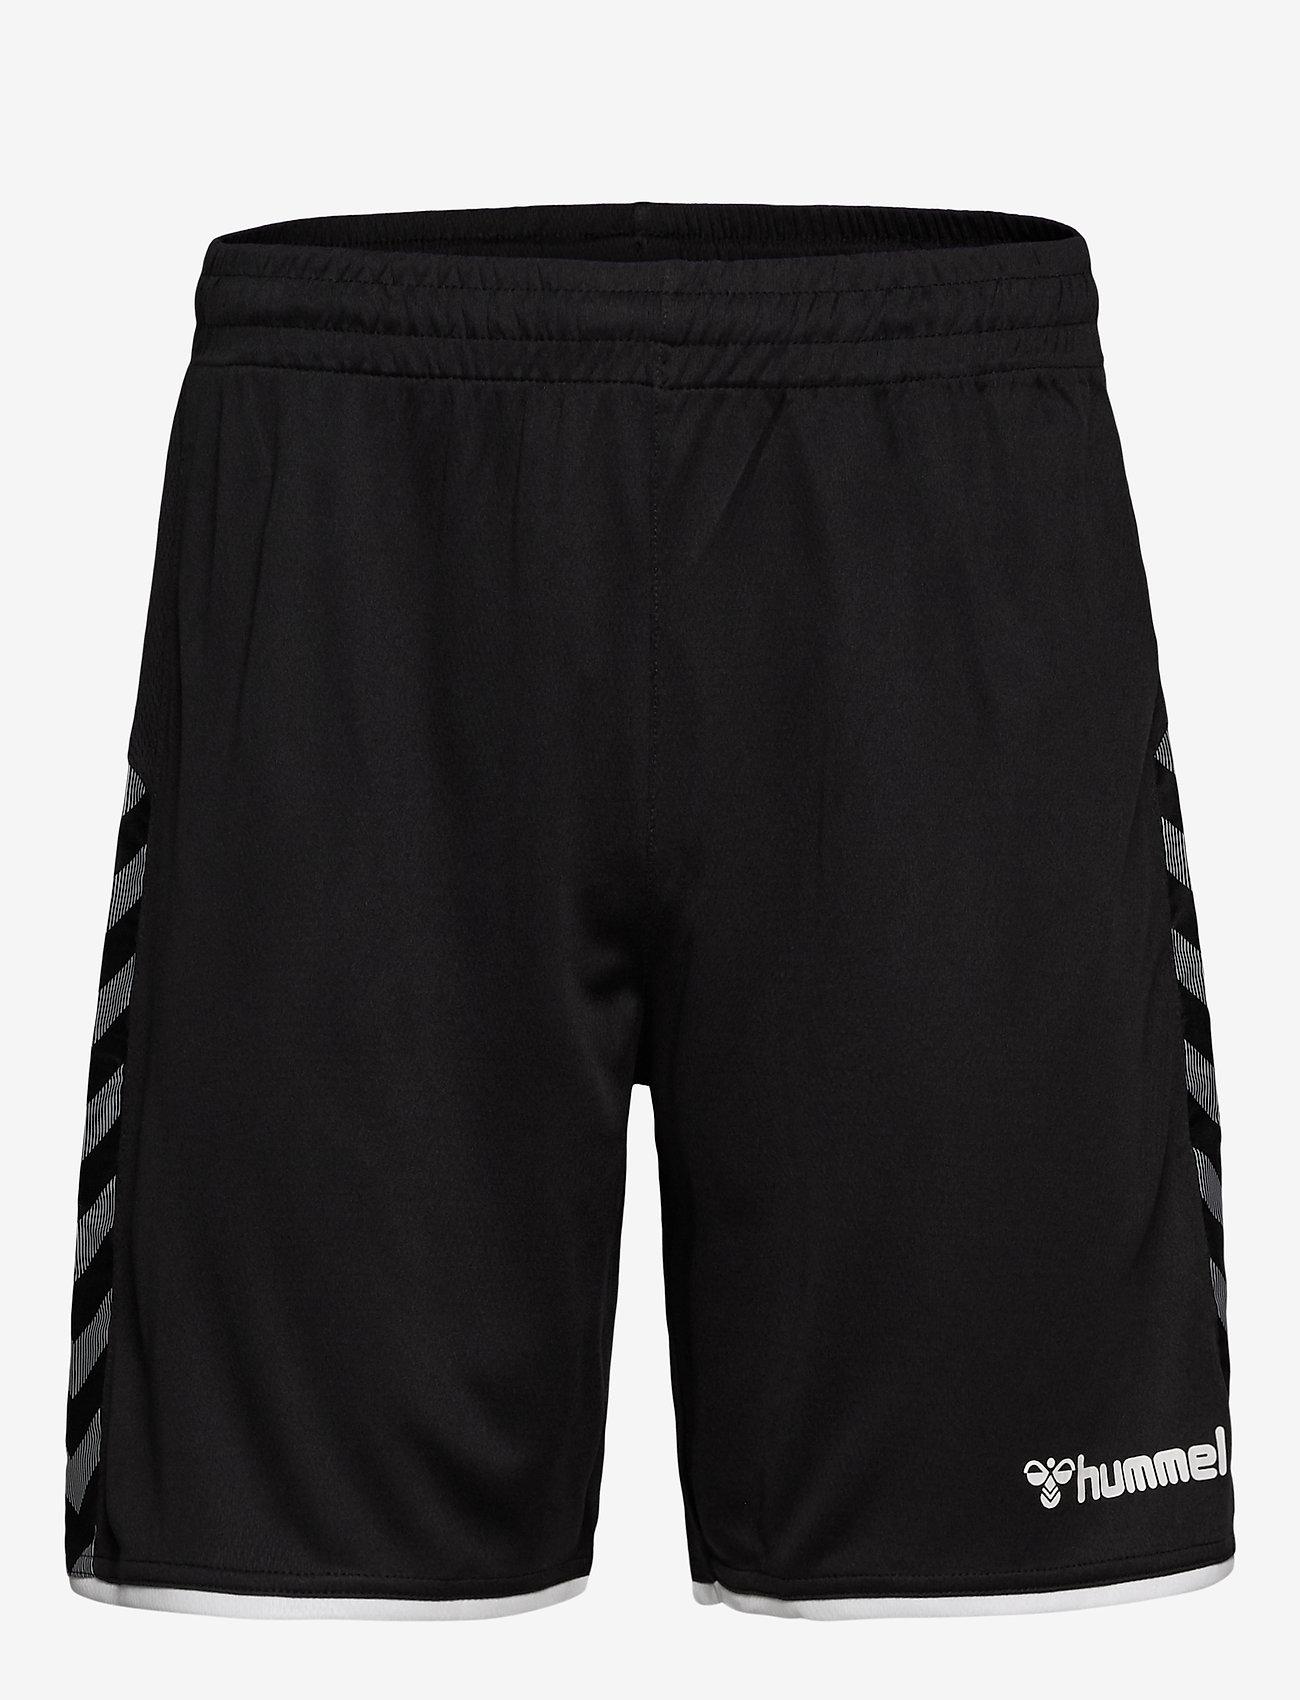 Hummel - hmlAUTHENTIC POLY SHORTS - training korte broek - black/white - 0